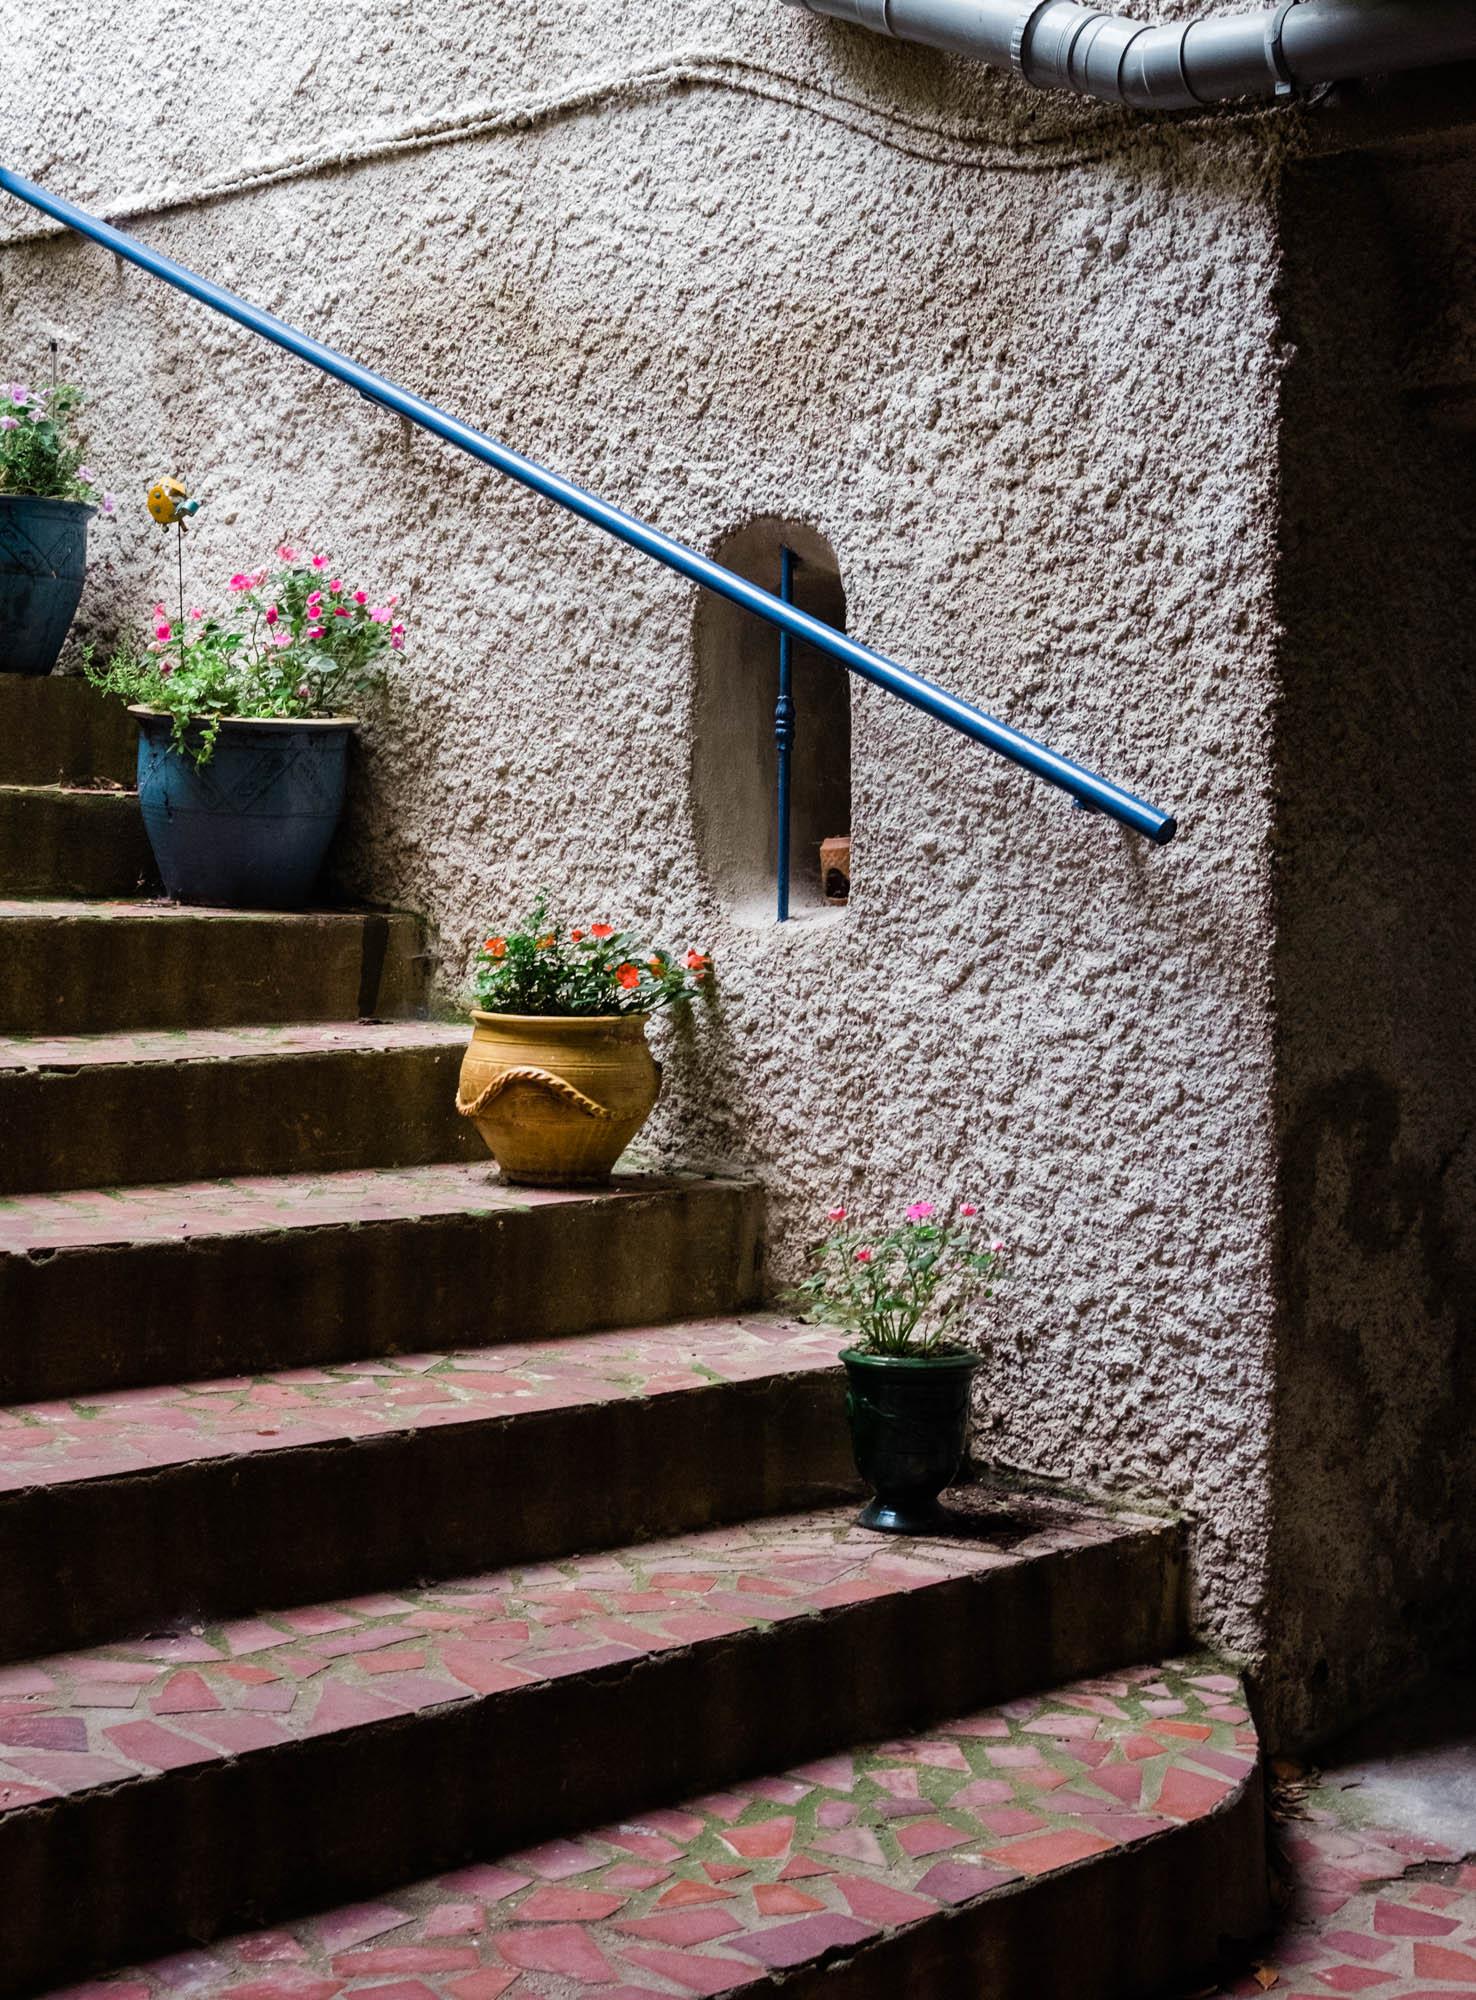 Steps inside the family home